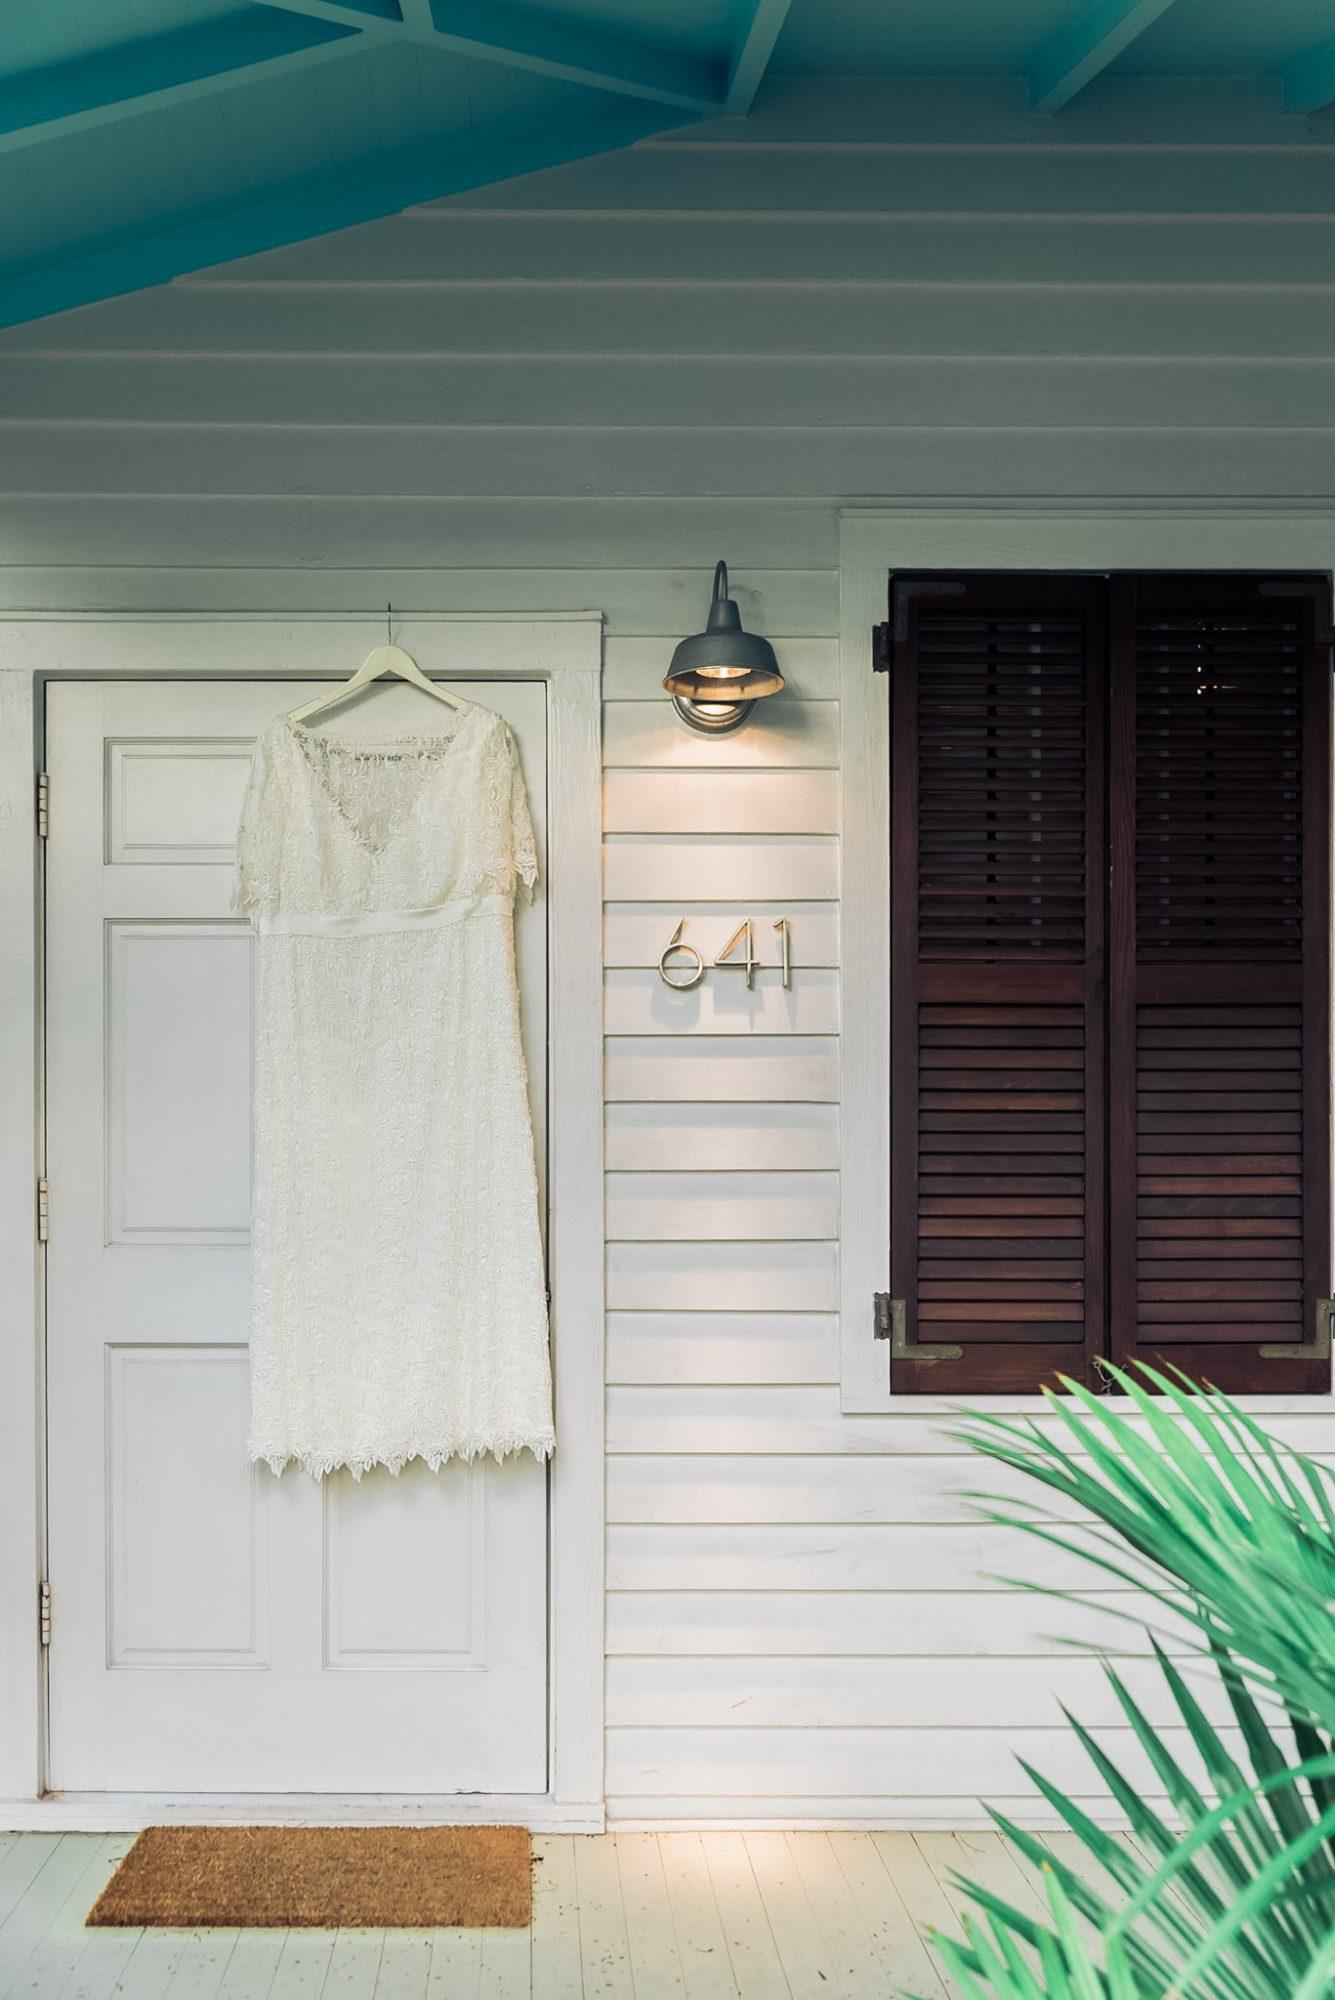 Becca and Leigh Hemingway Home Key West 17 - Becca & Leigh - Key West Wedding Photographer - Ernest Hemingway House